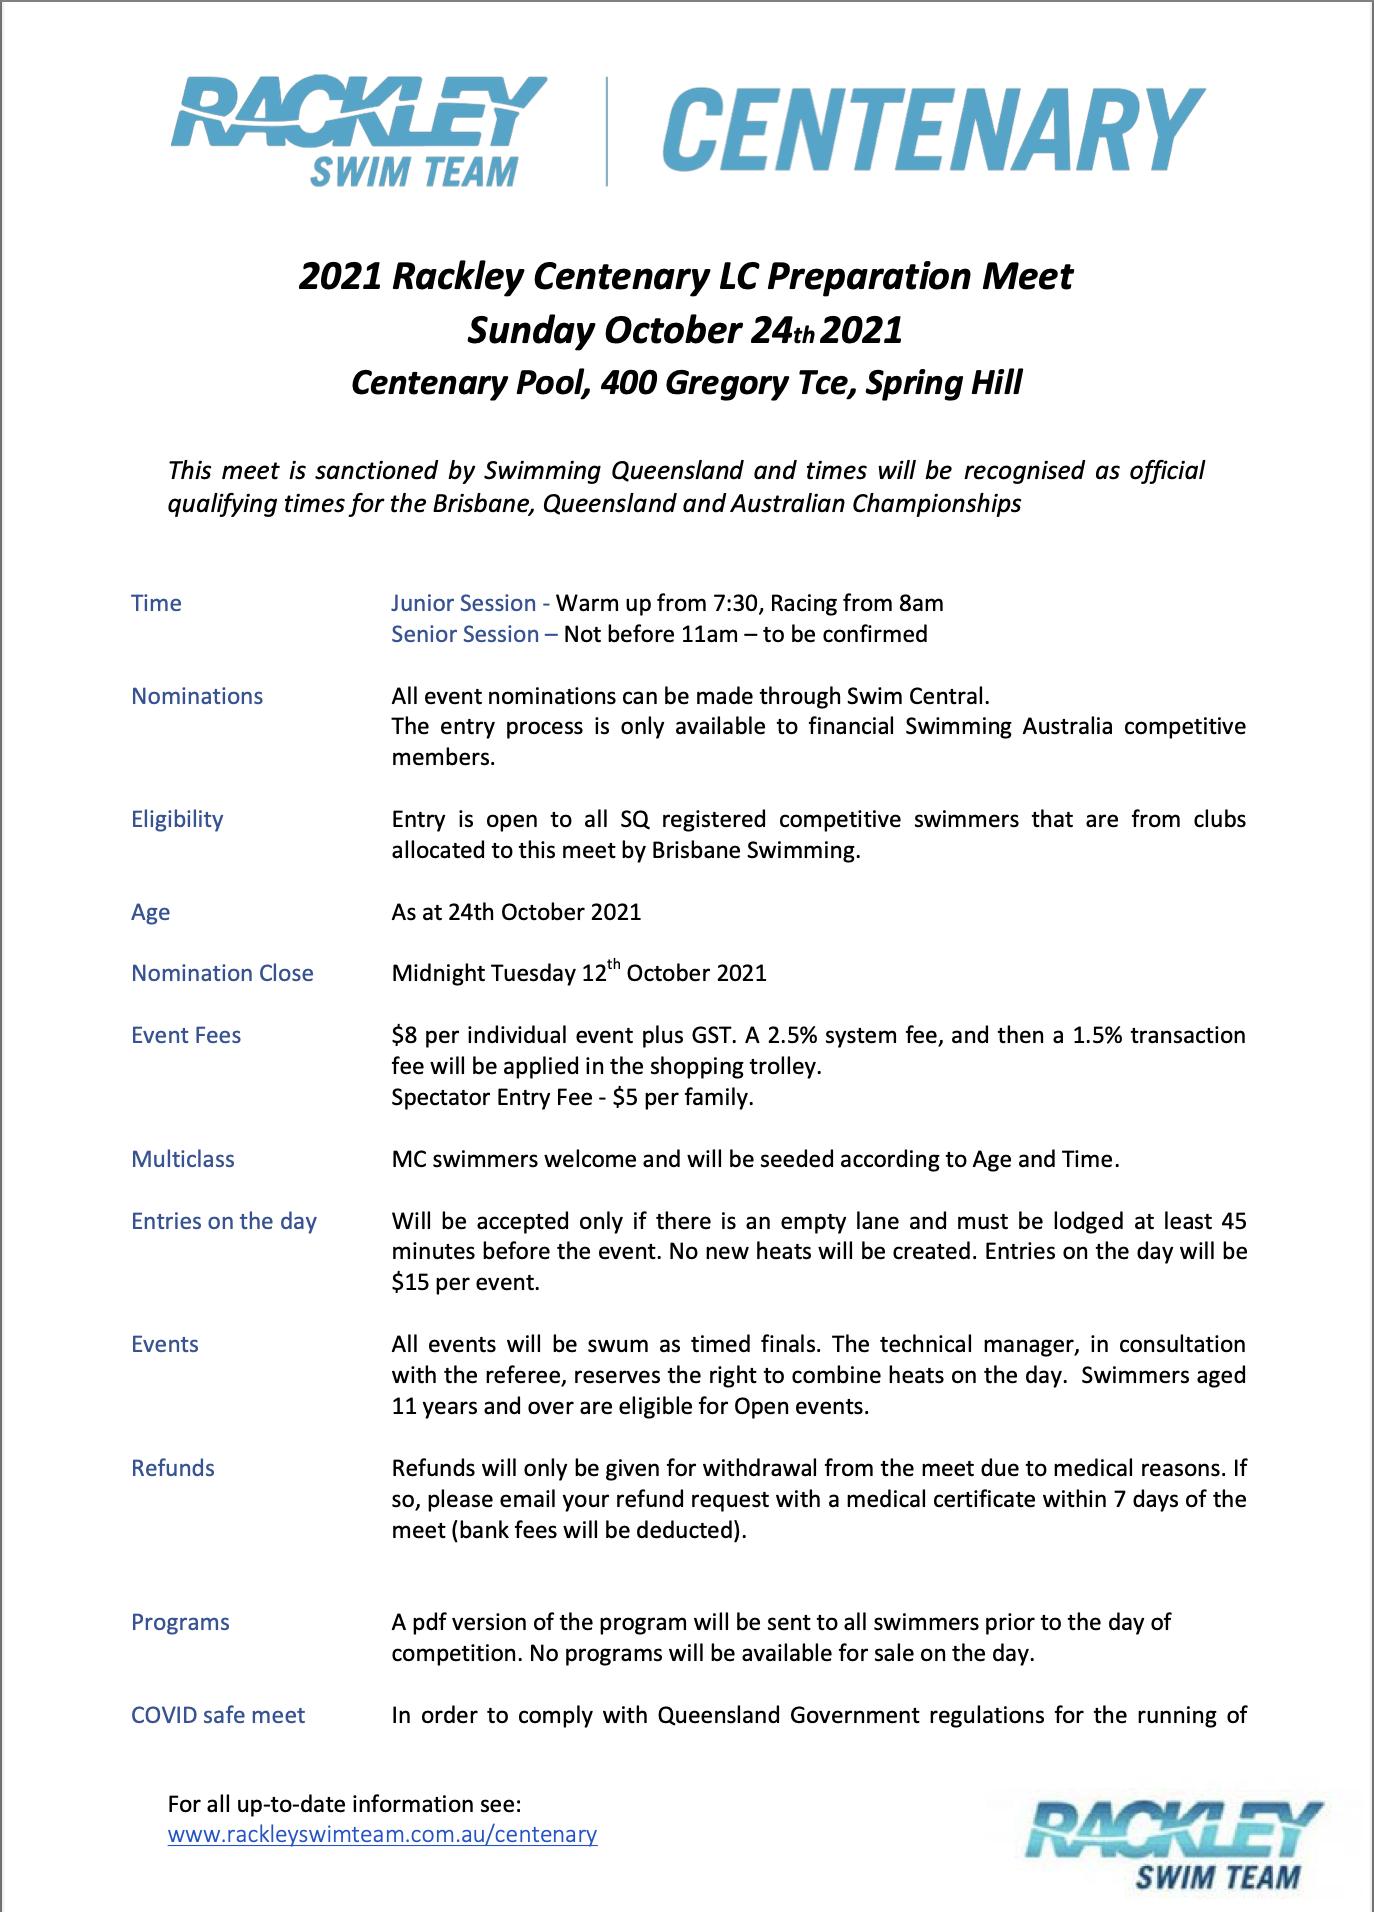 2021 Rackley Centenary LC Prep Meet - Sunday 24 October